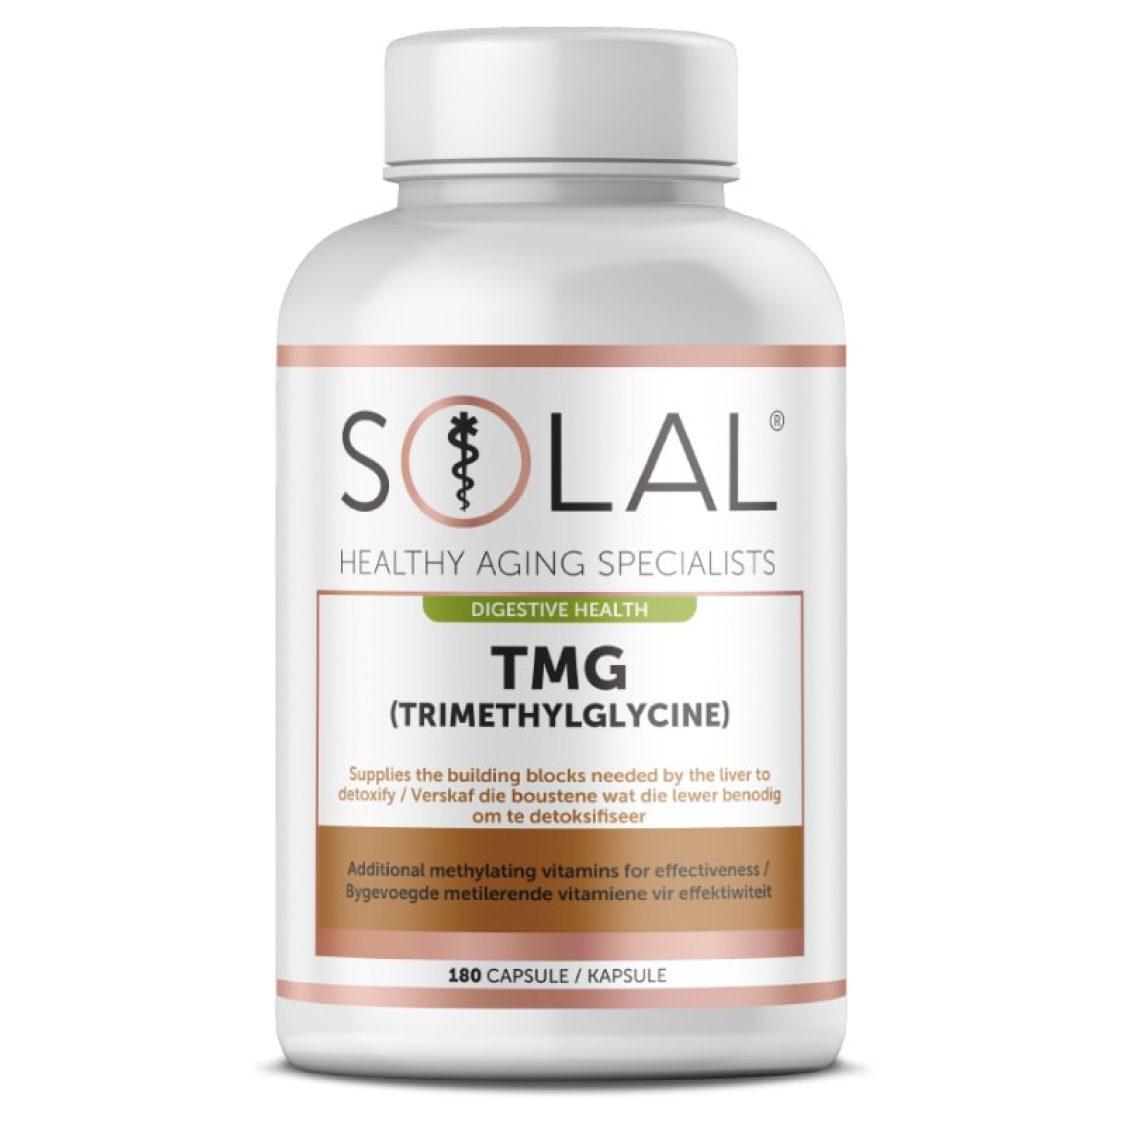 Solal - TMG (Trimethylglycine/Betaine)